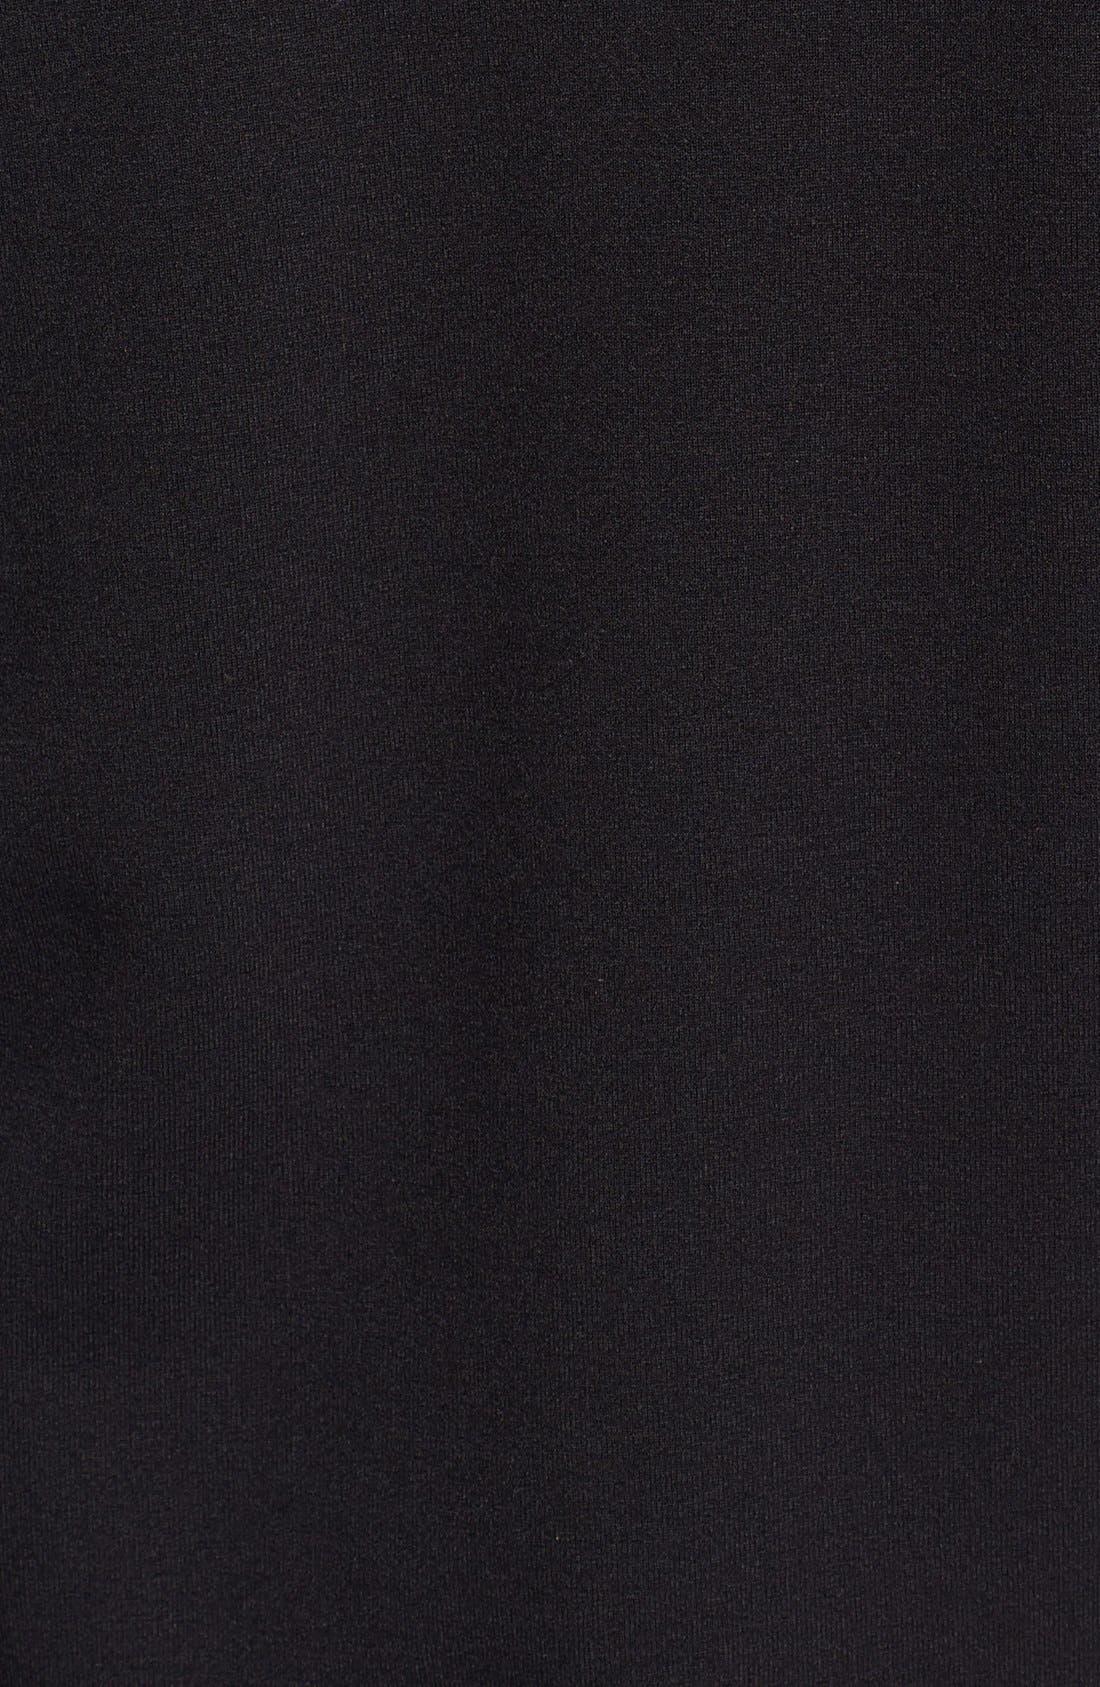 Alternate Image 3  - Arc'teryx 'Lorum' Technical Hoodie